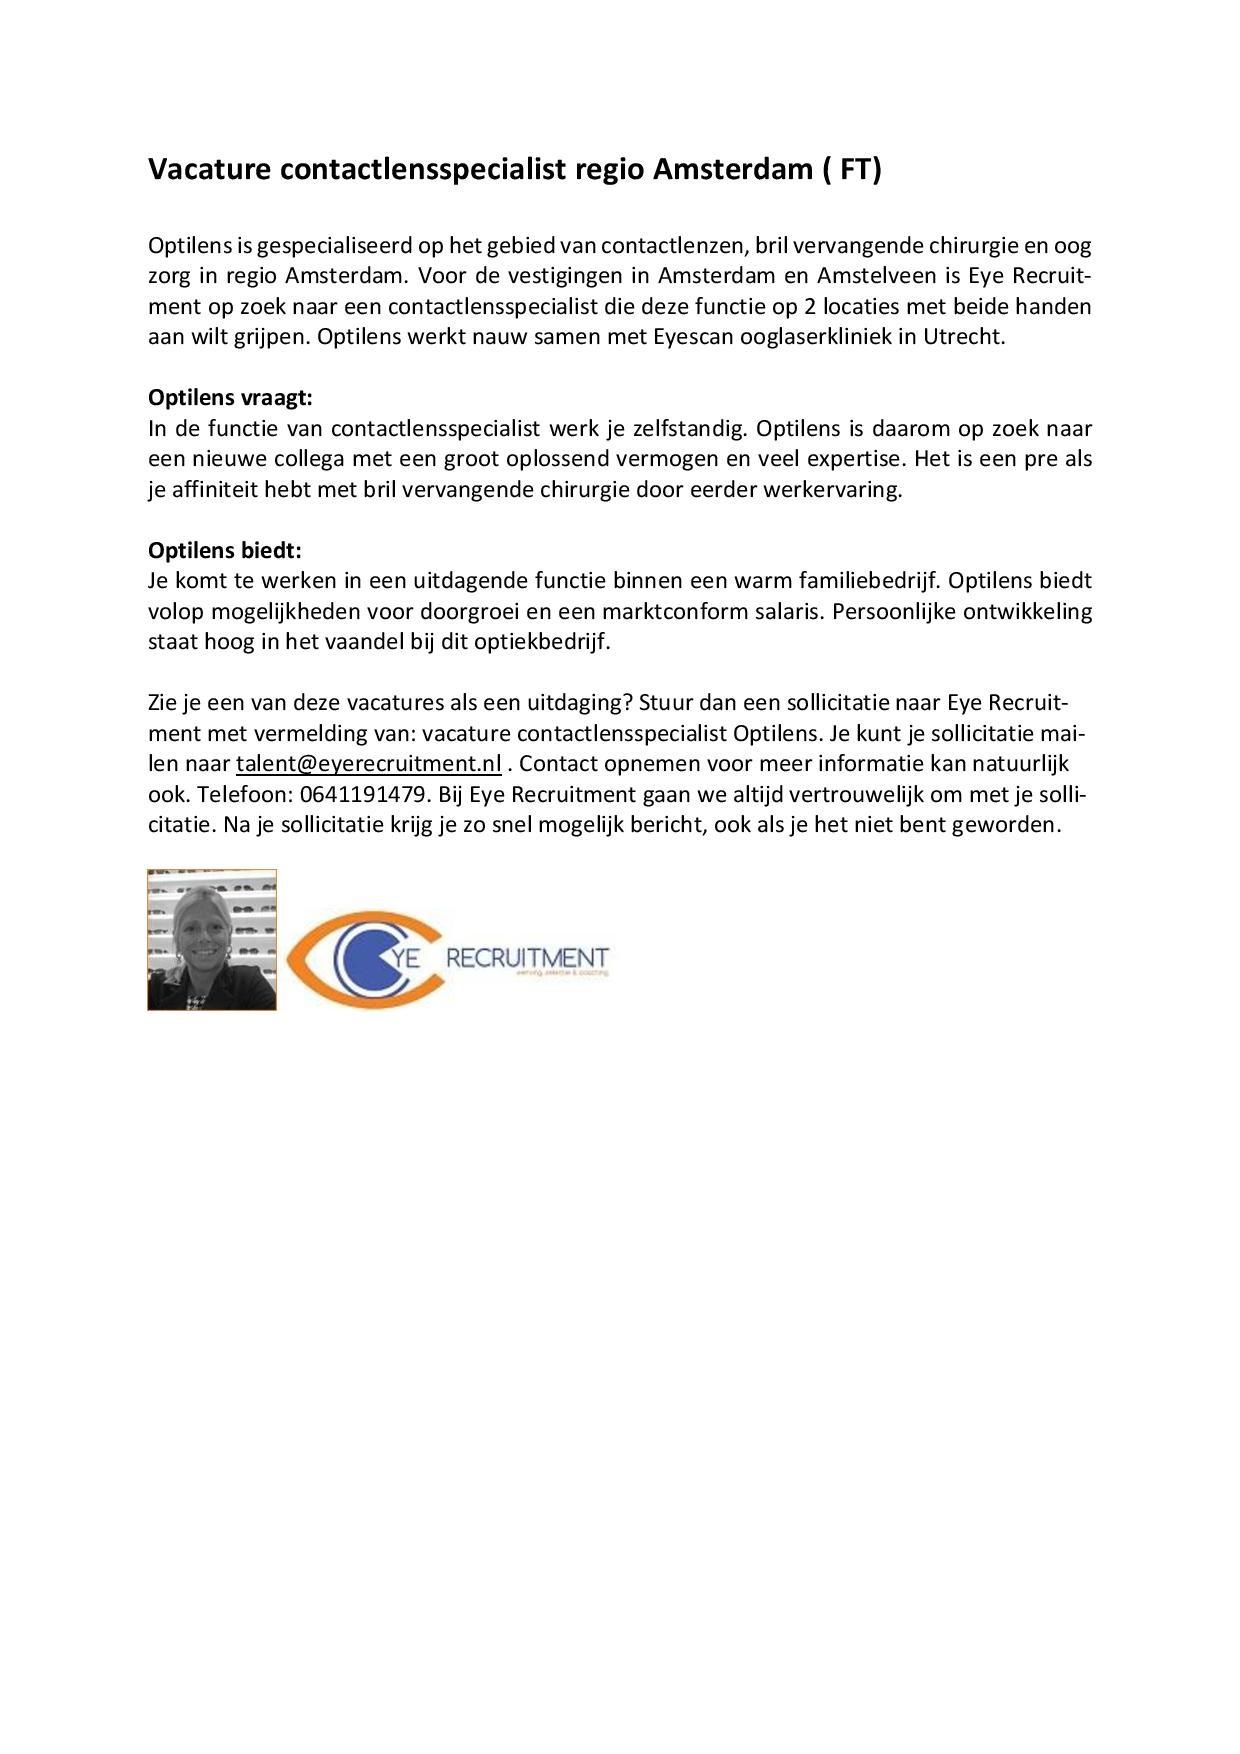 vacature contactlensspecialist optilens-page-001